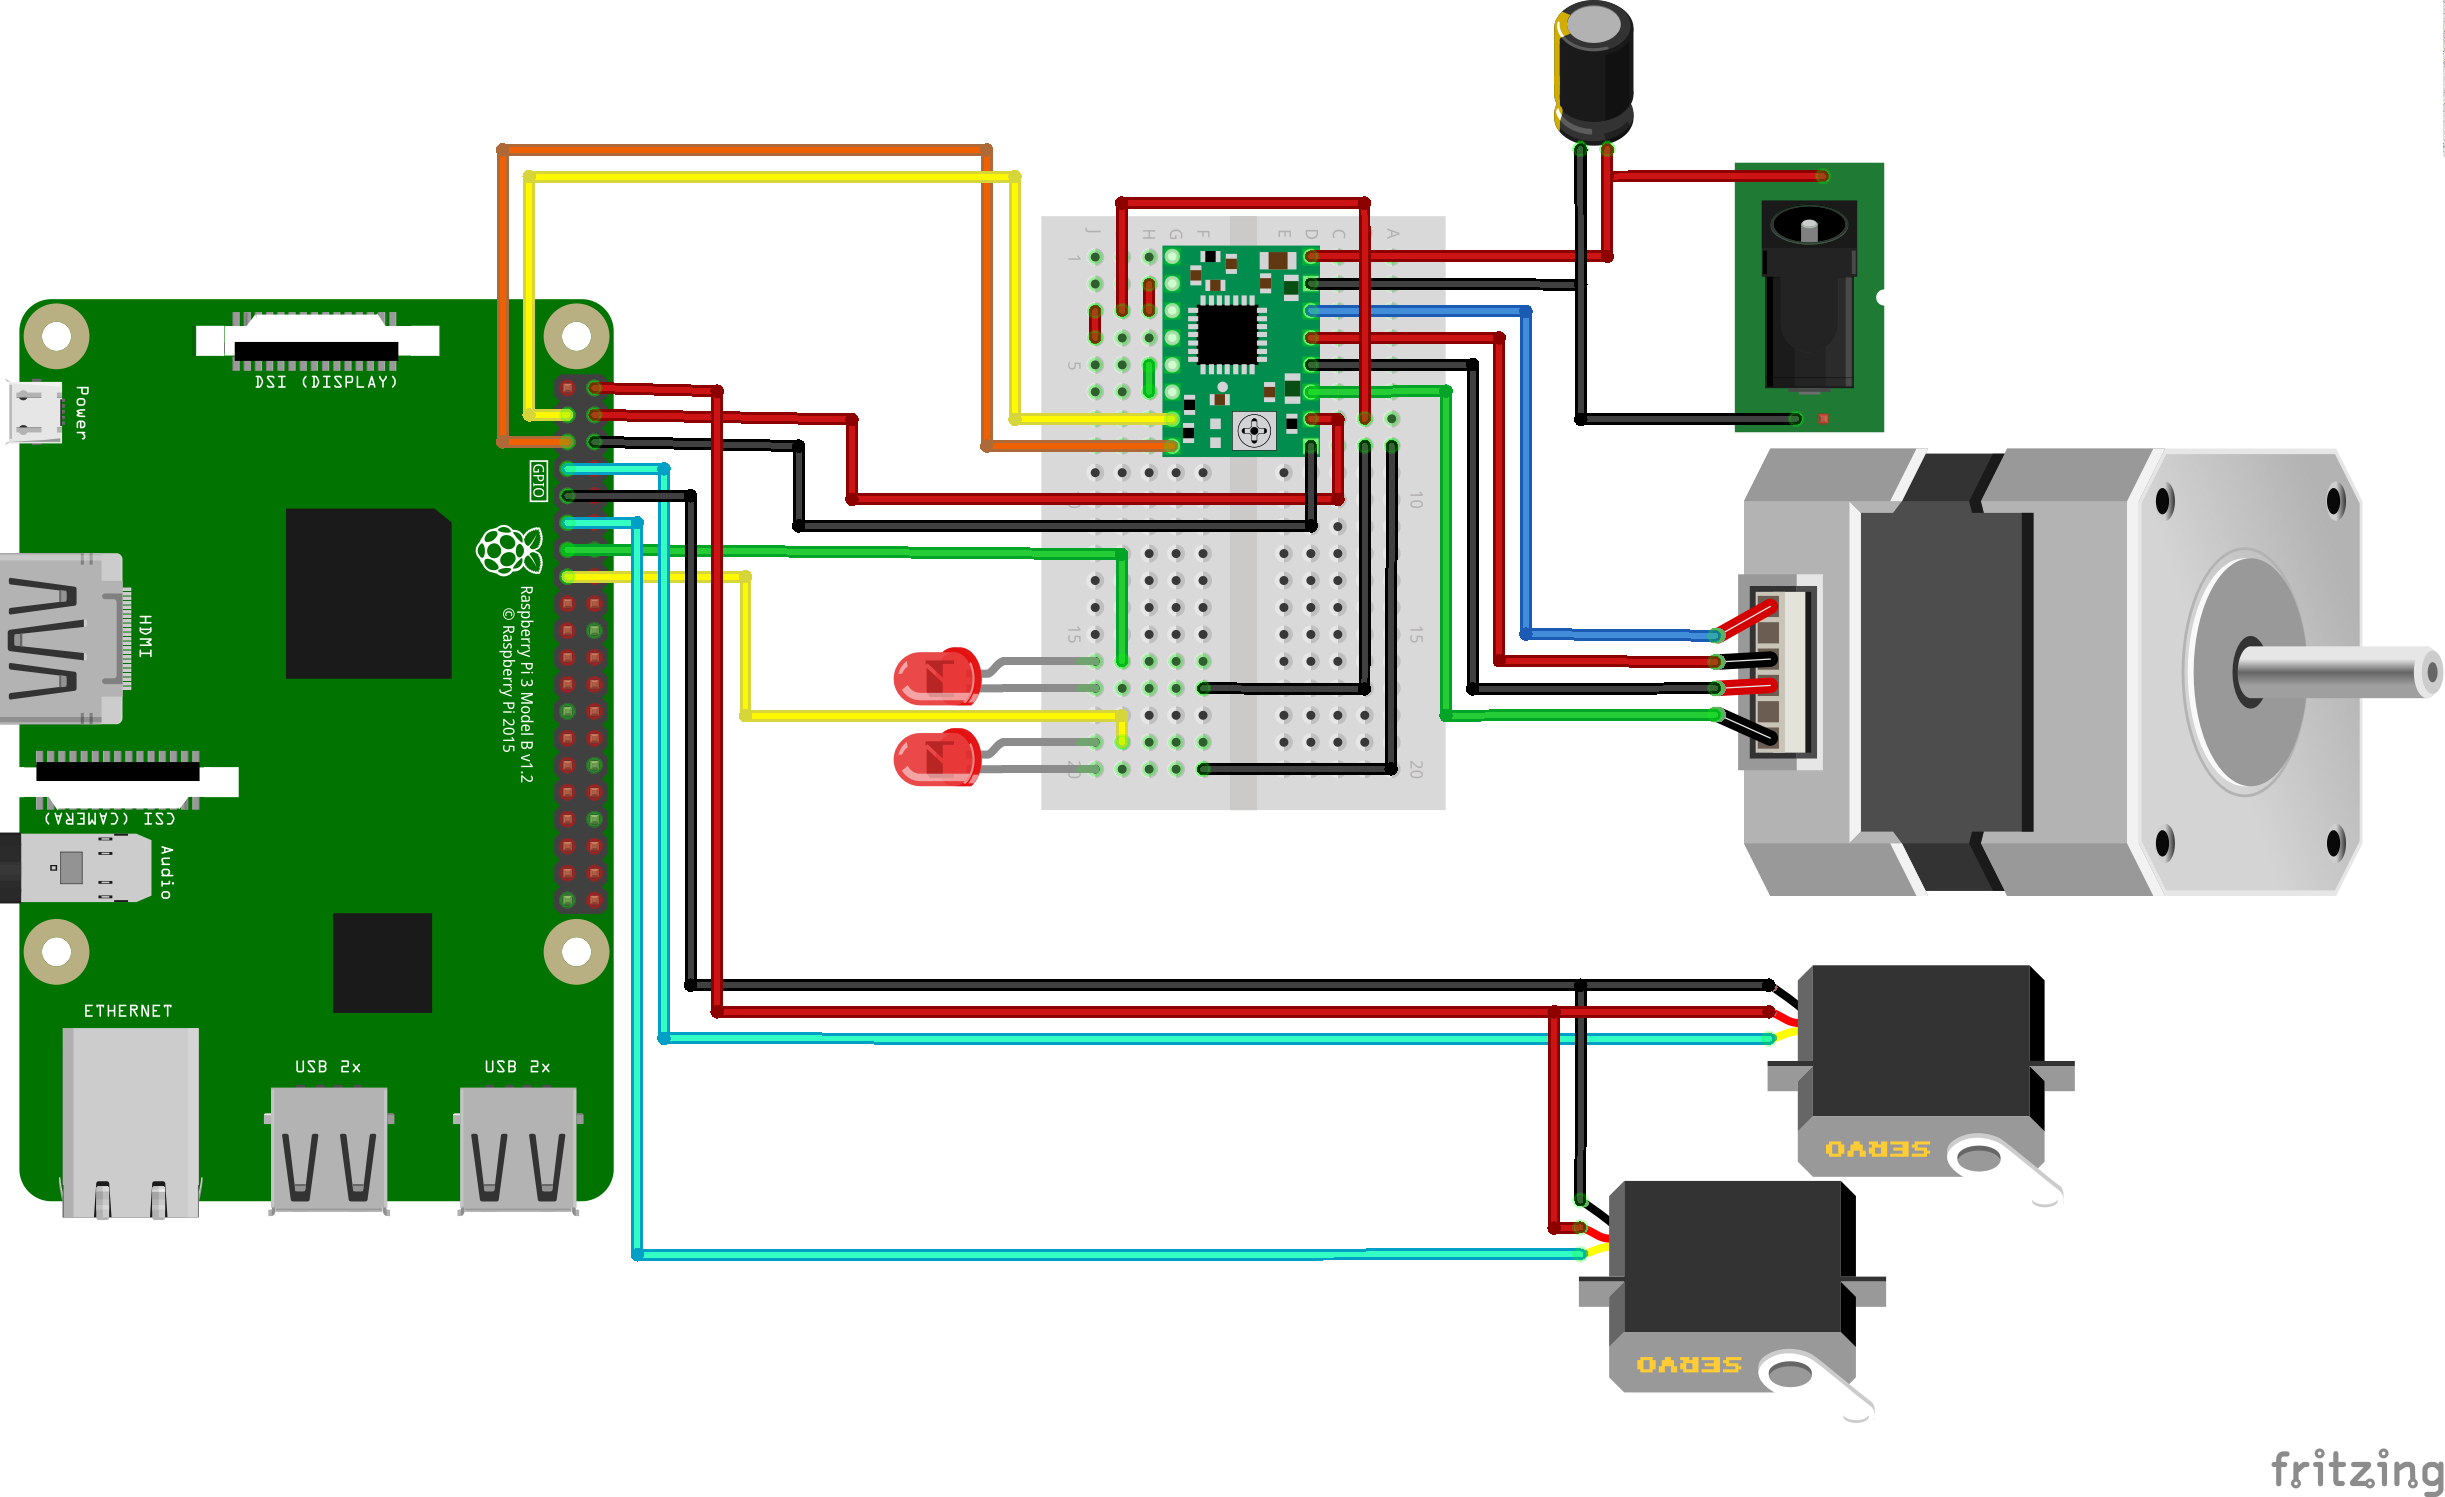 Control a RaspberryPi Robot using Python and a mobile